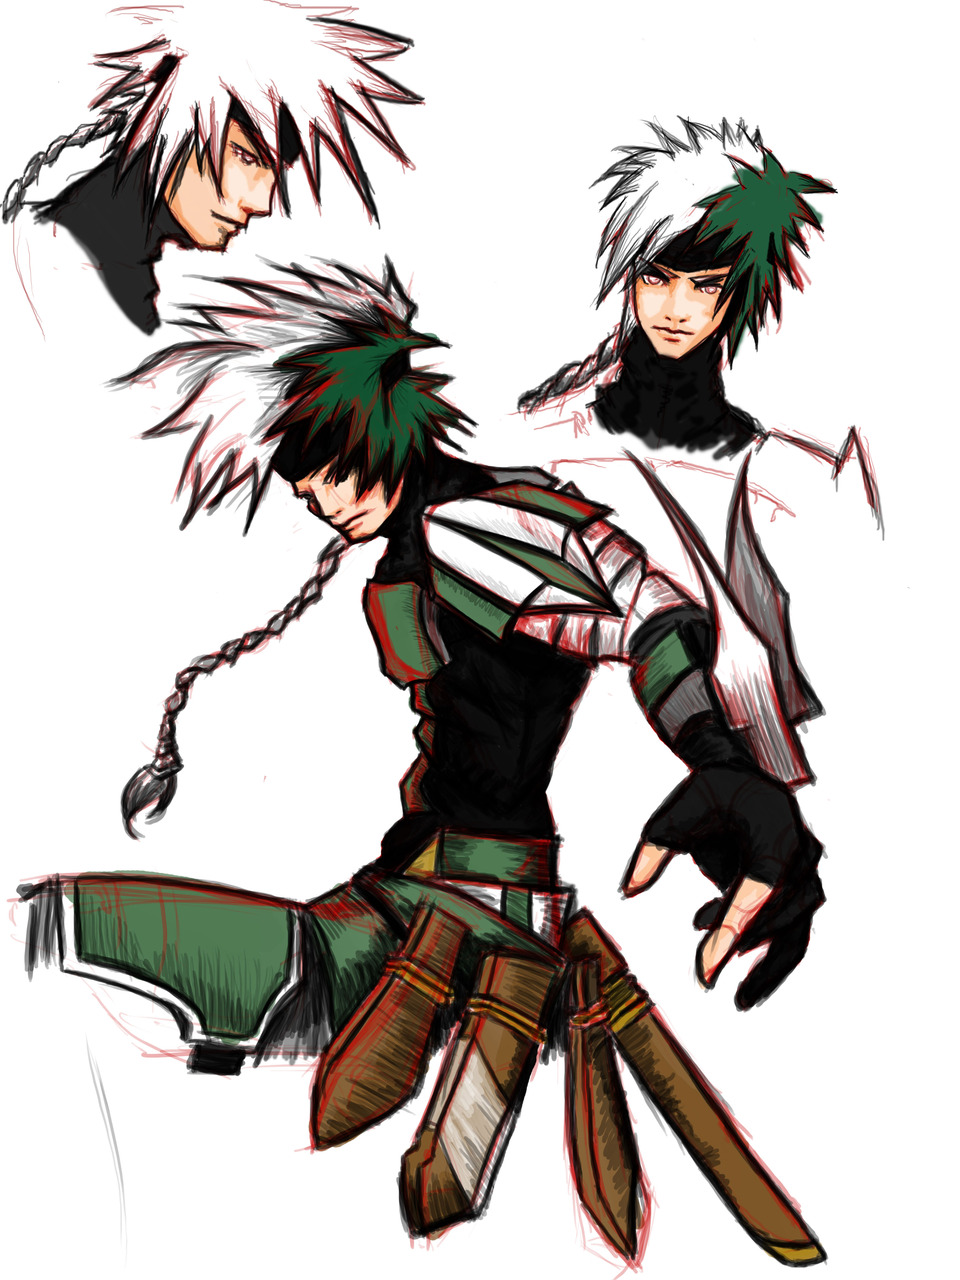 Character Design Manga Anime : Character design ninja by nickedge on deviantart